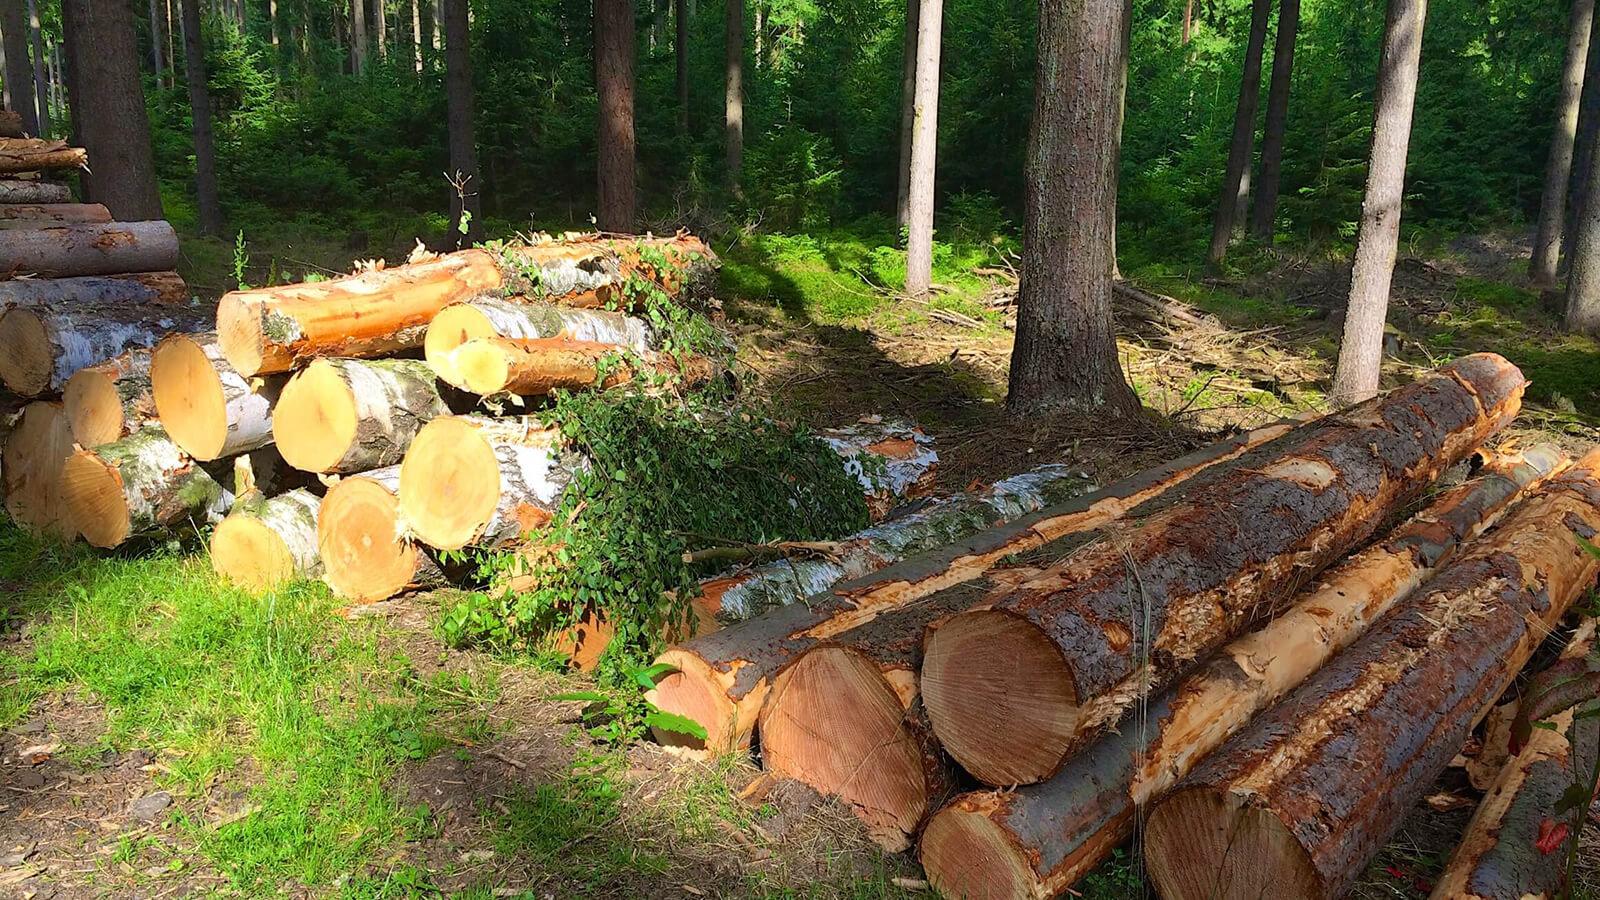 Outdoor & Trekking - wir lieben den Wald